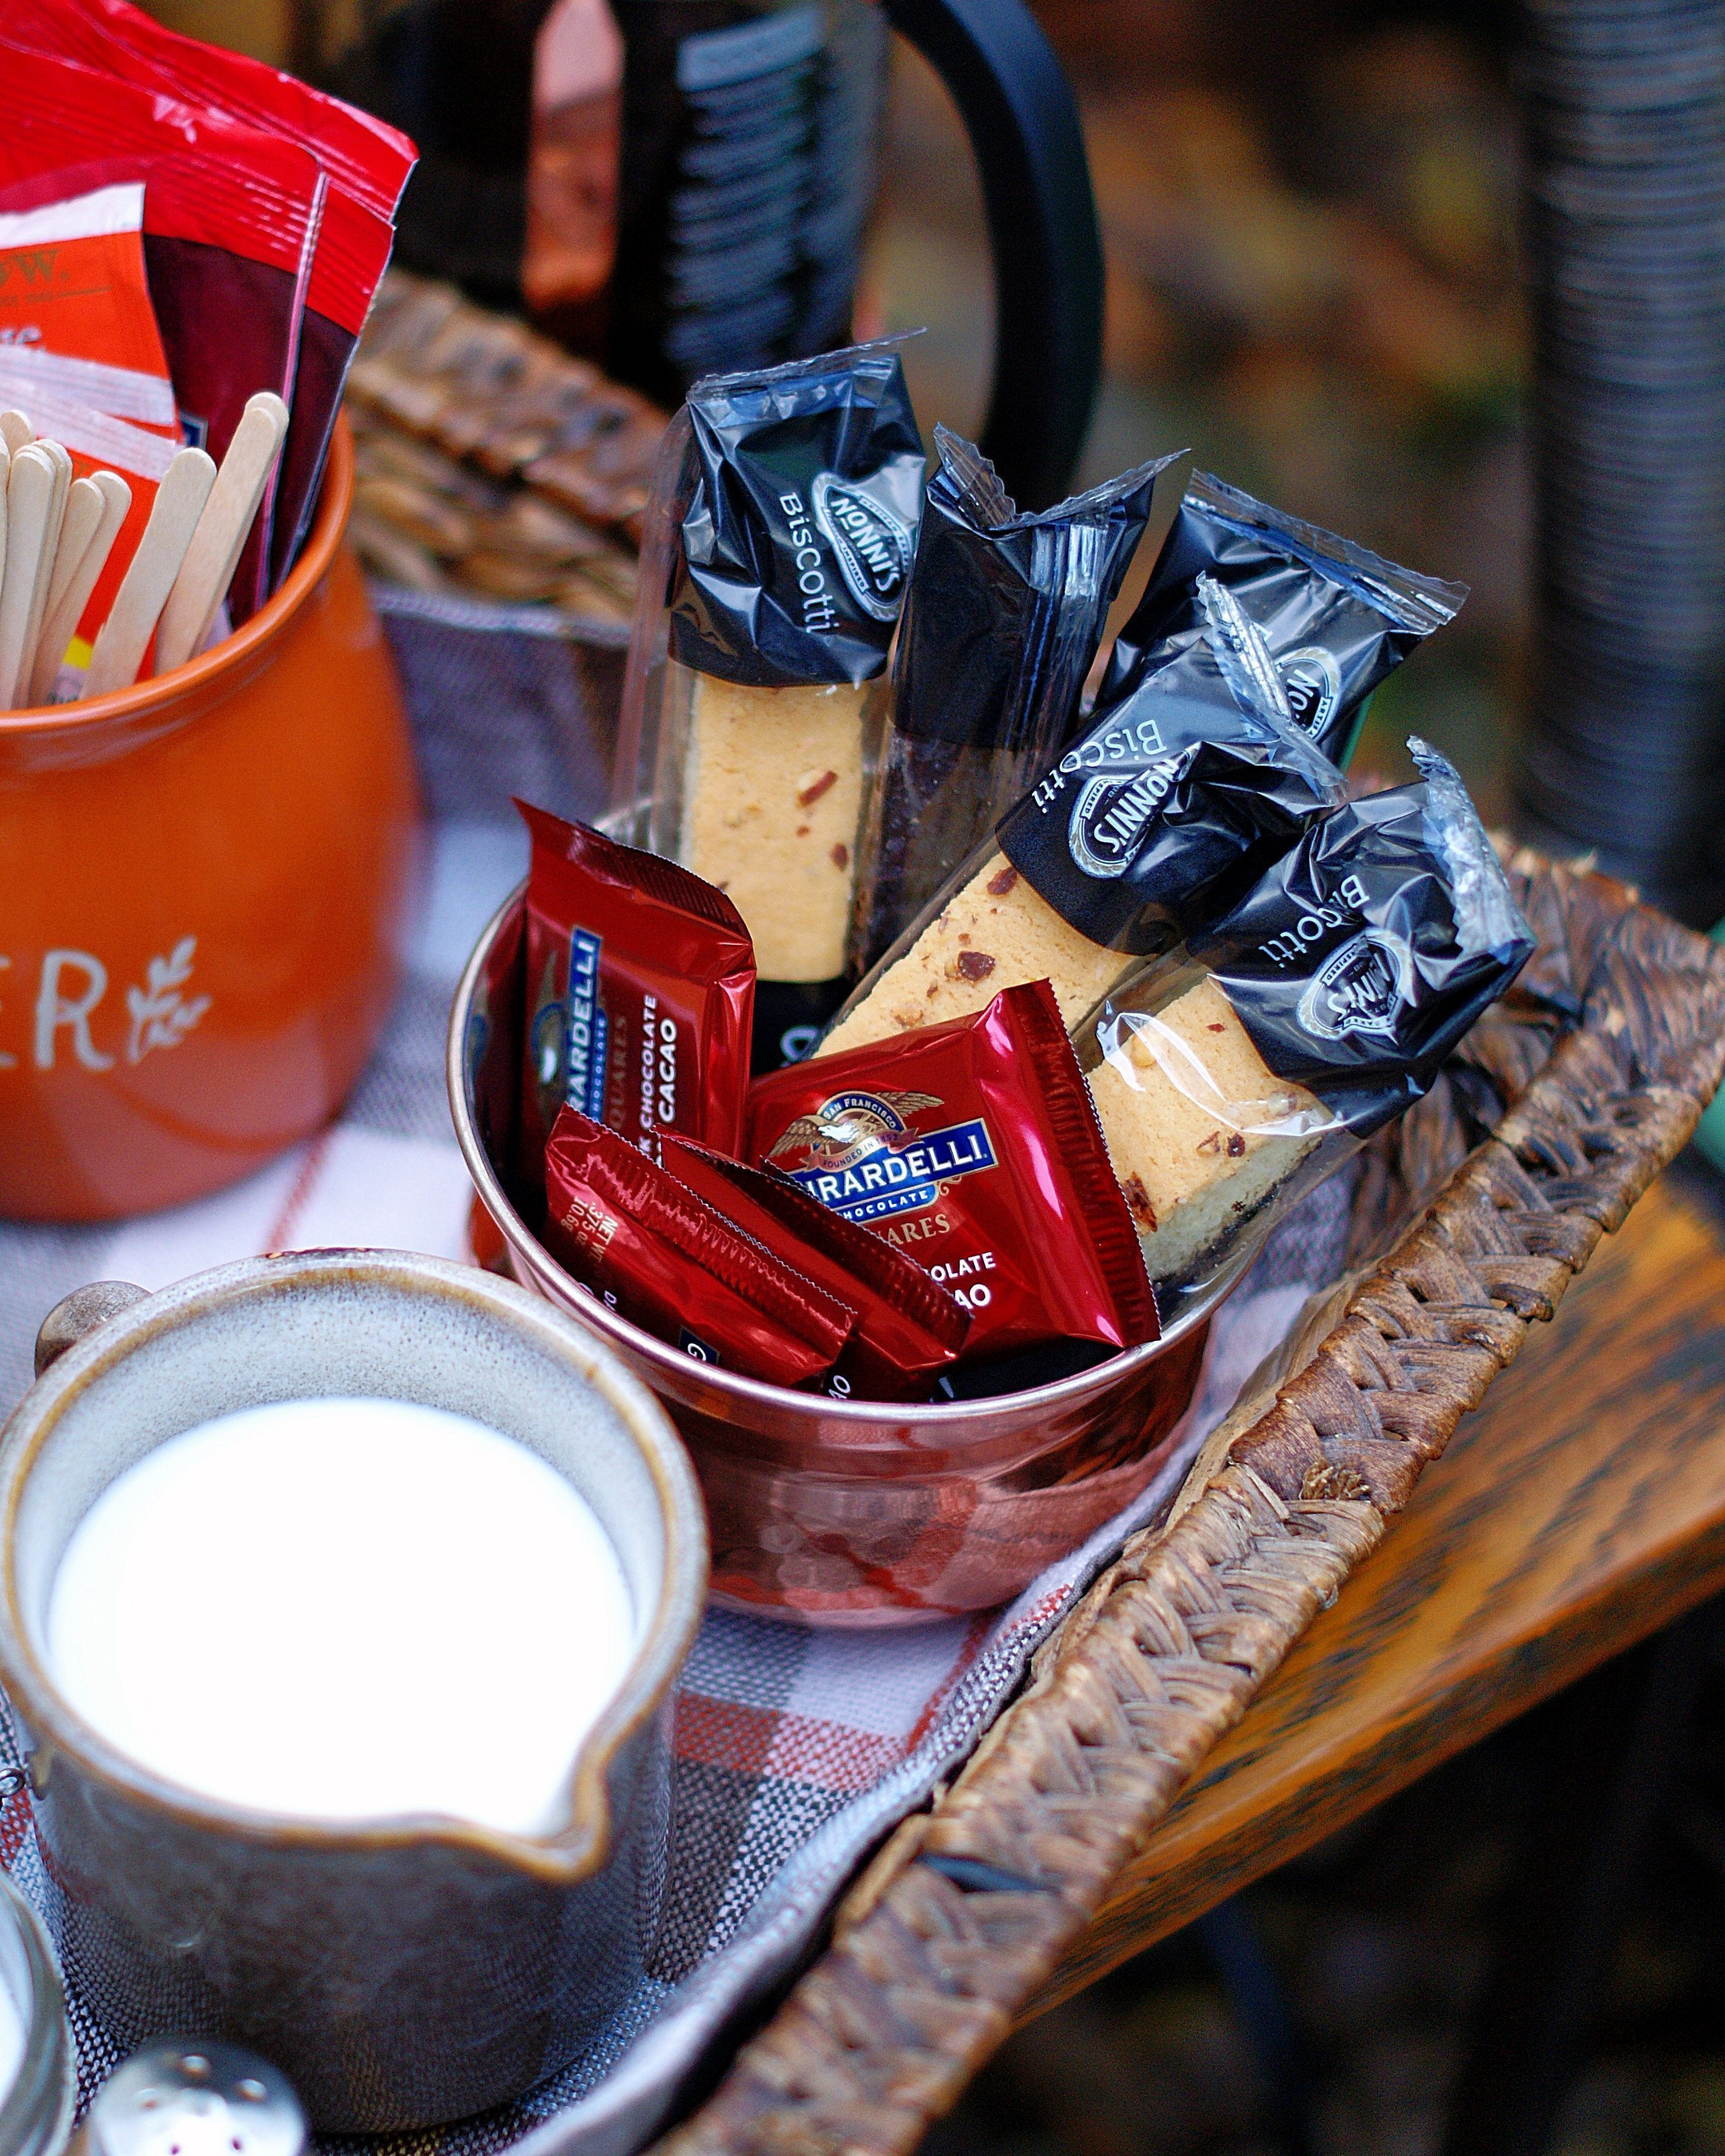 Coffee Station Chocolate & Biscotti